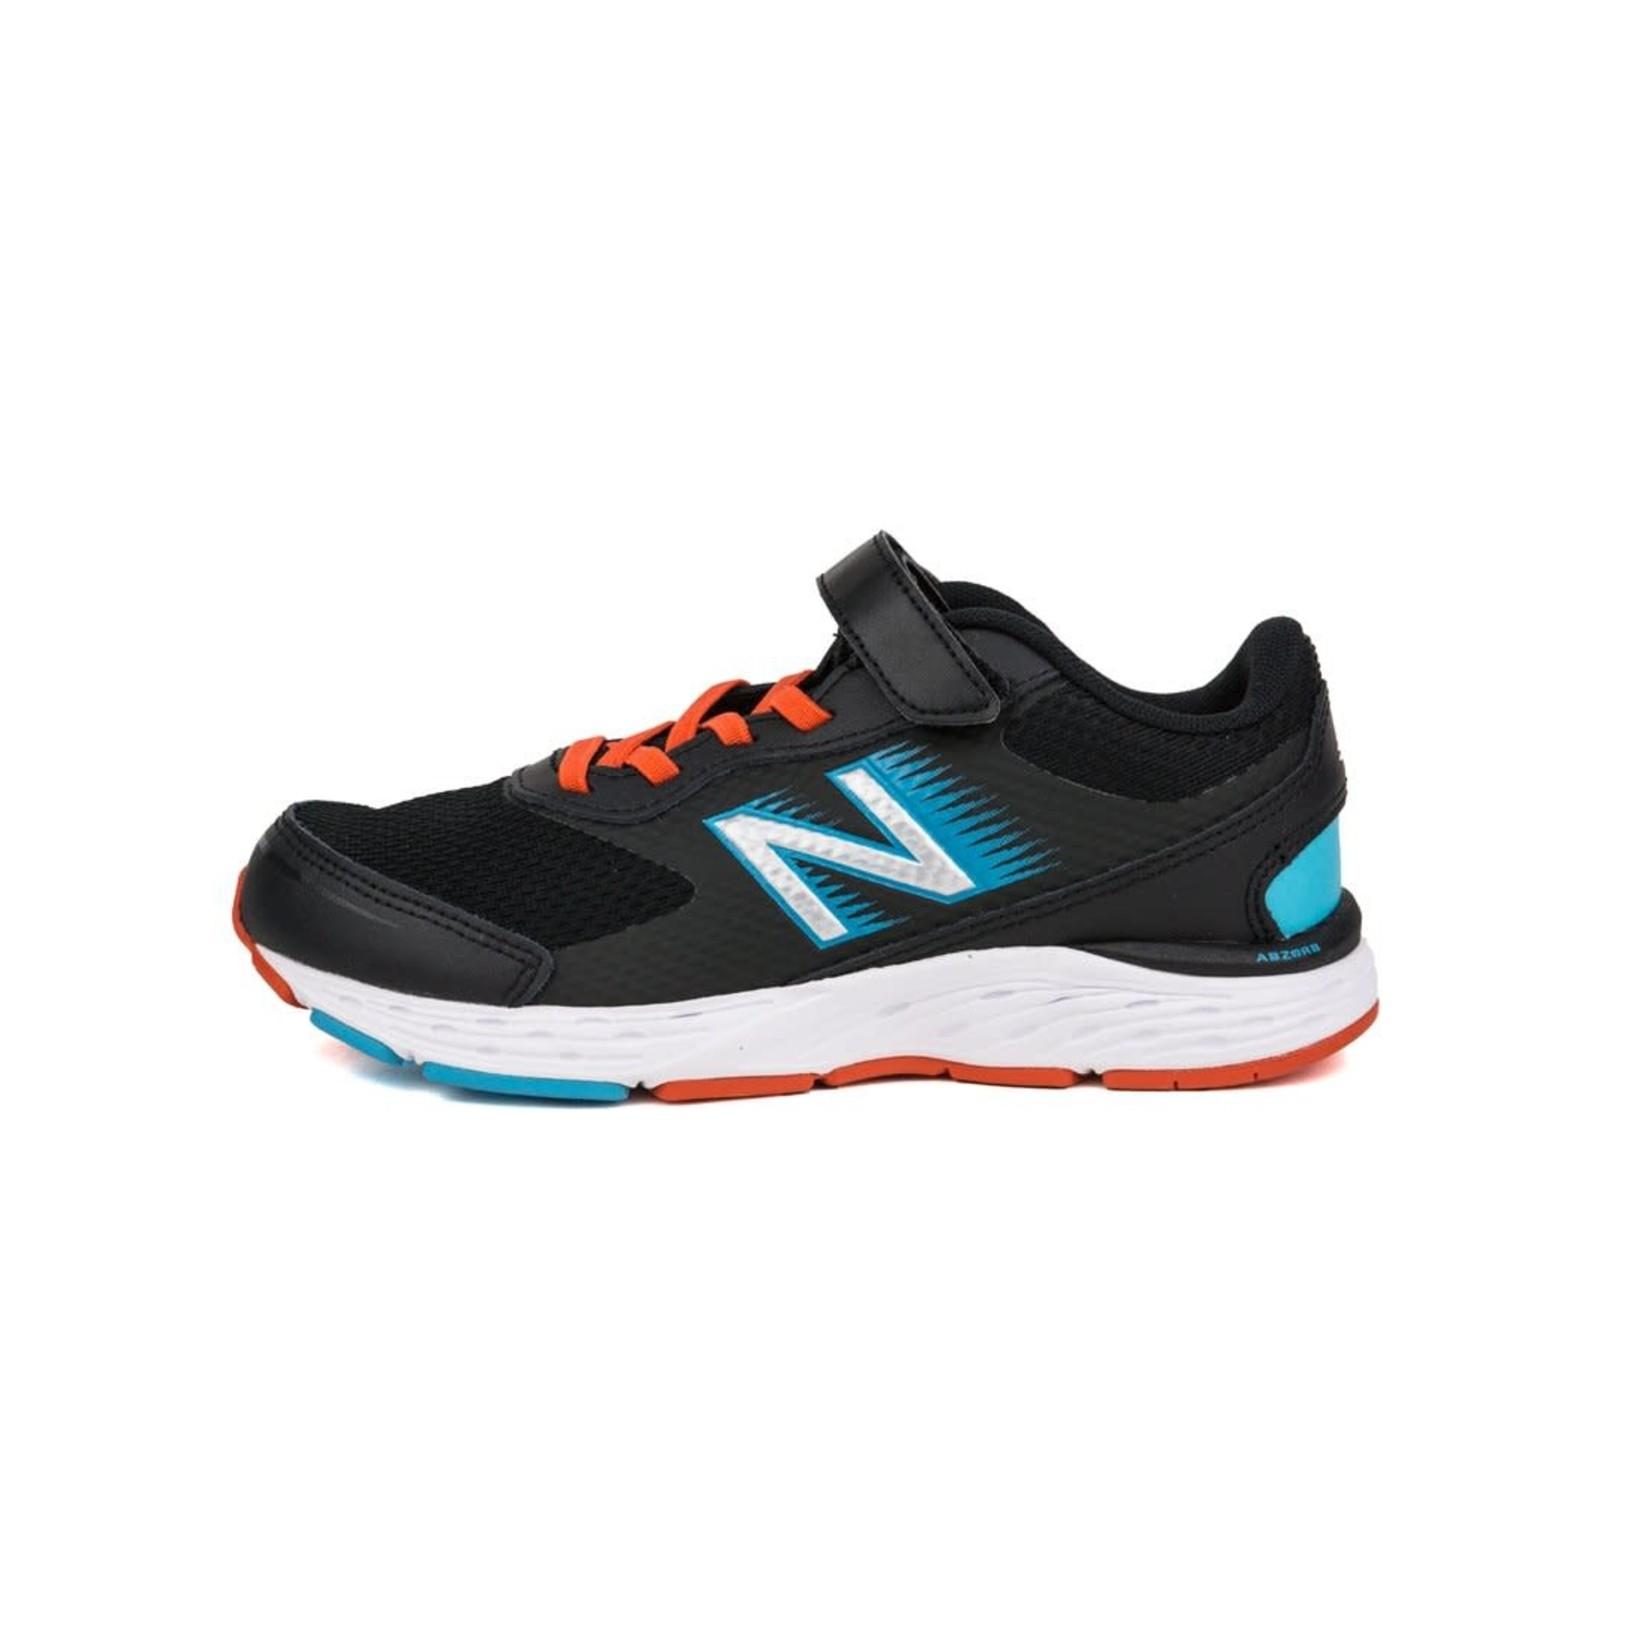 New Balance New Balance Running Shoes, YA680BG6, Boys